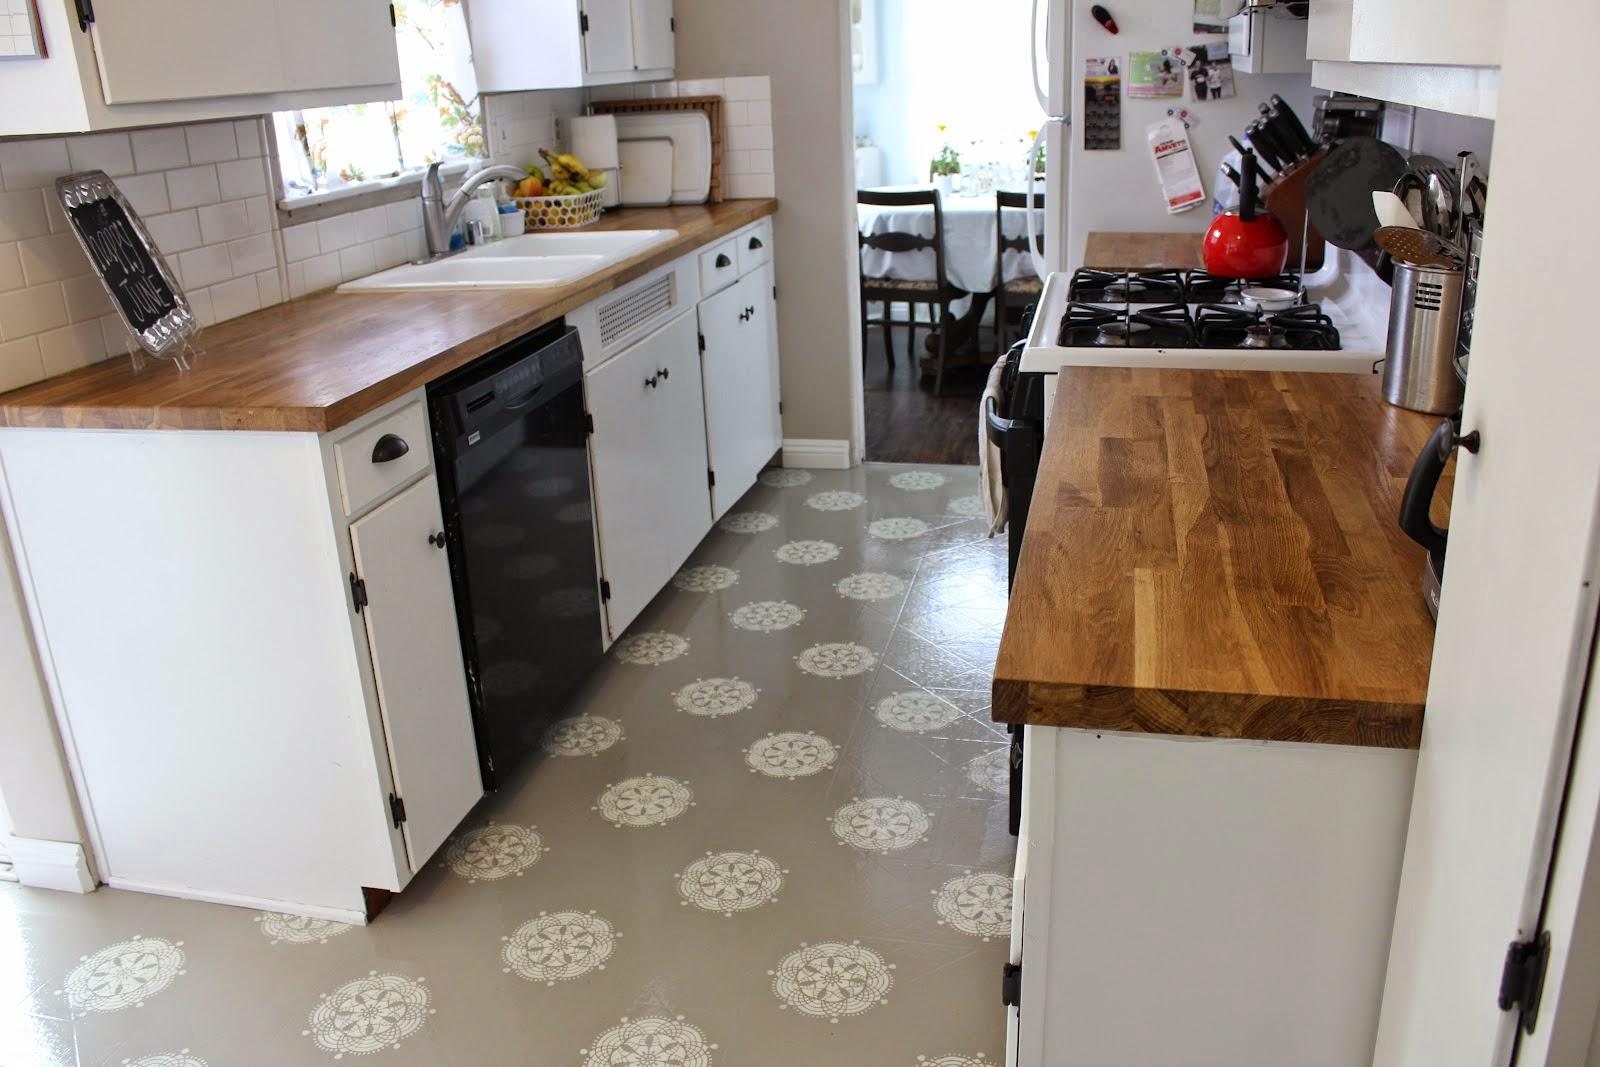 lantai keramik dapur minimalis 2014